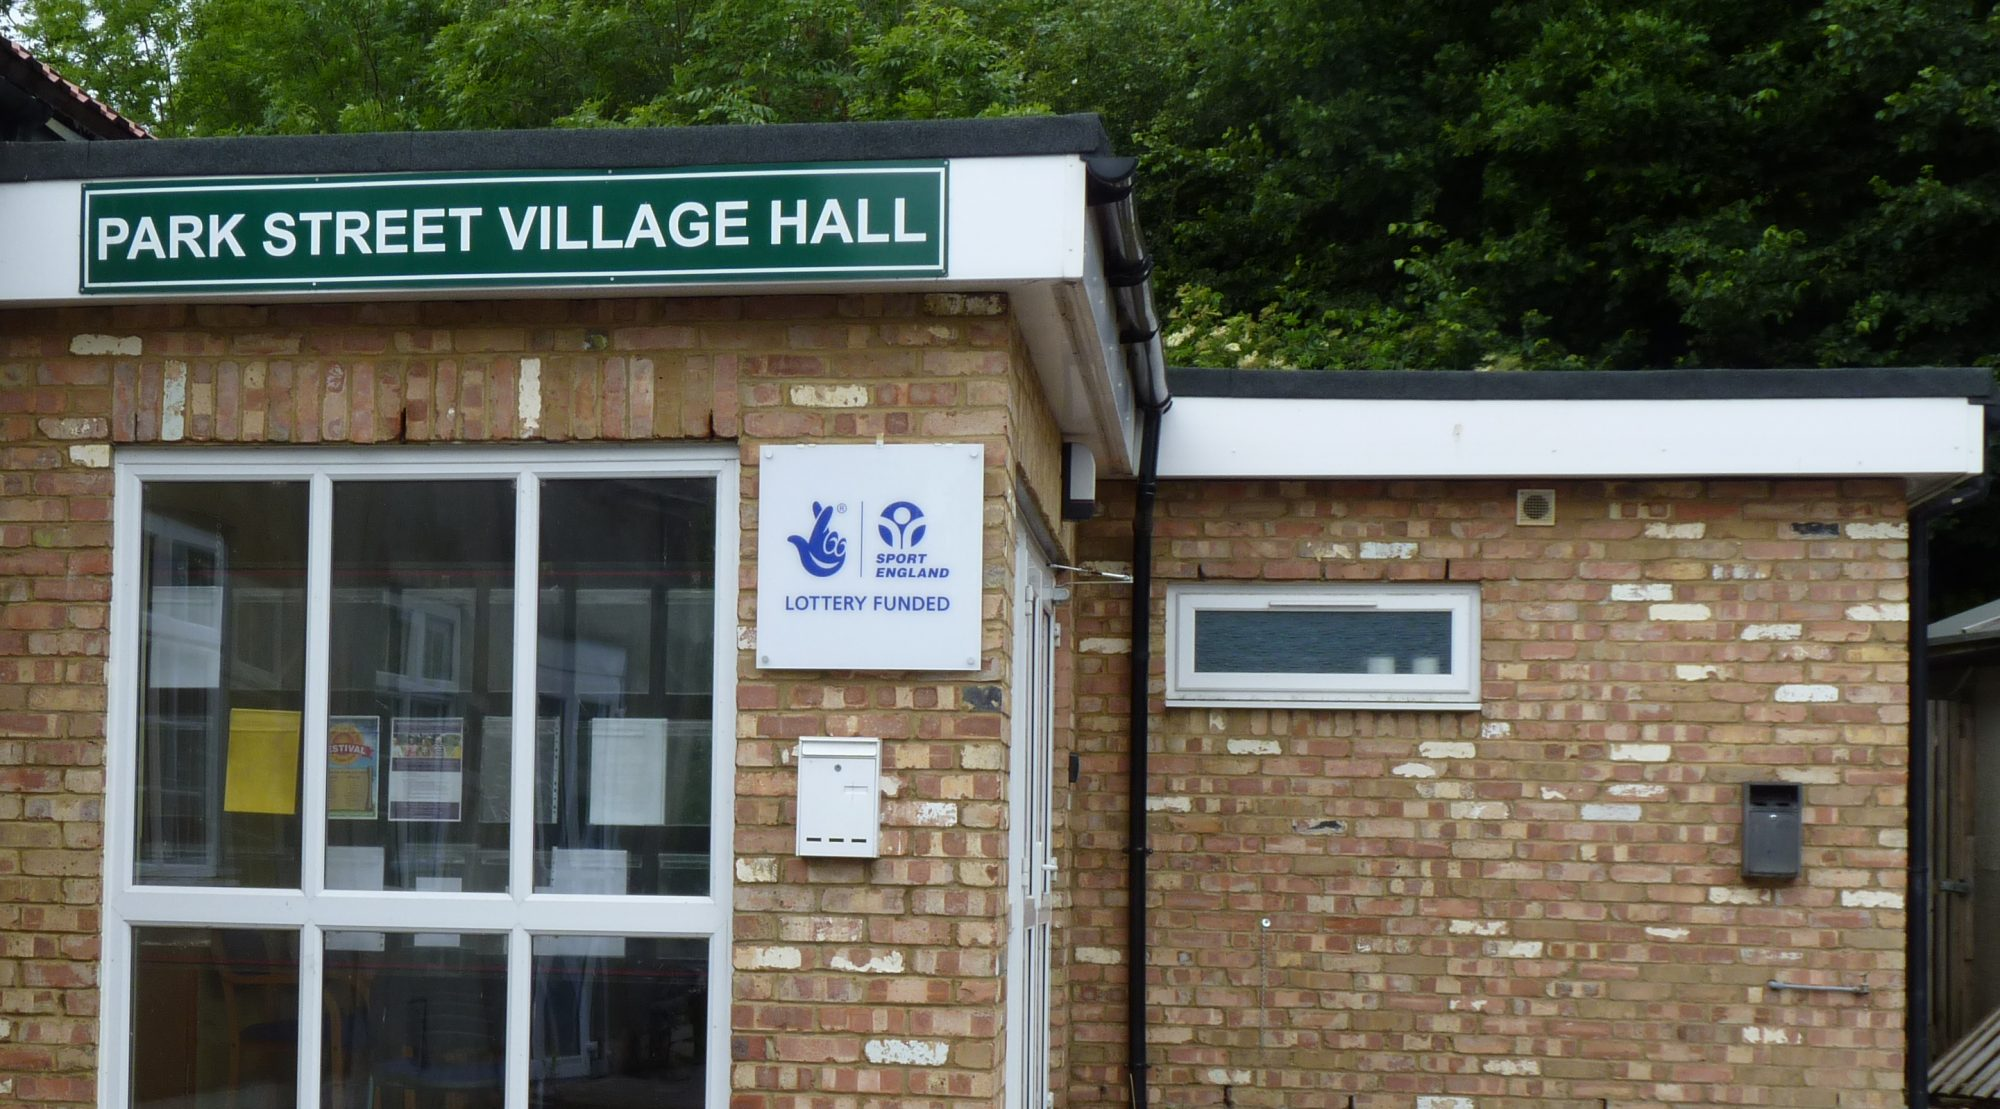 Park Street Village Hall